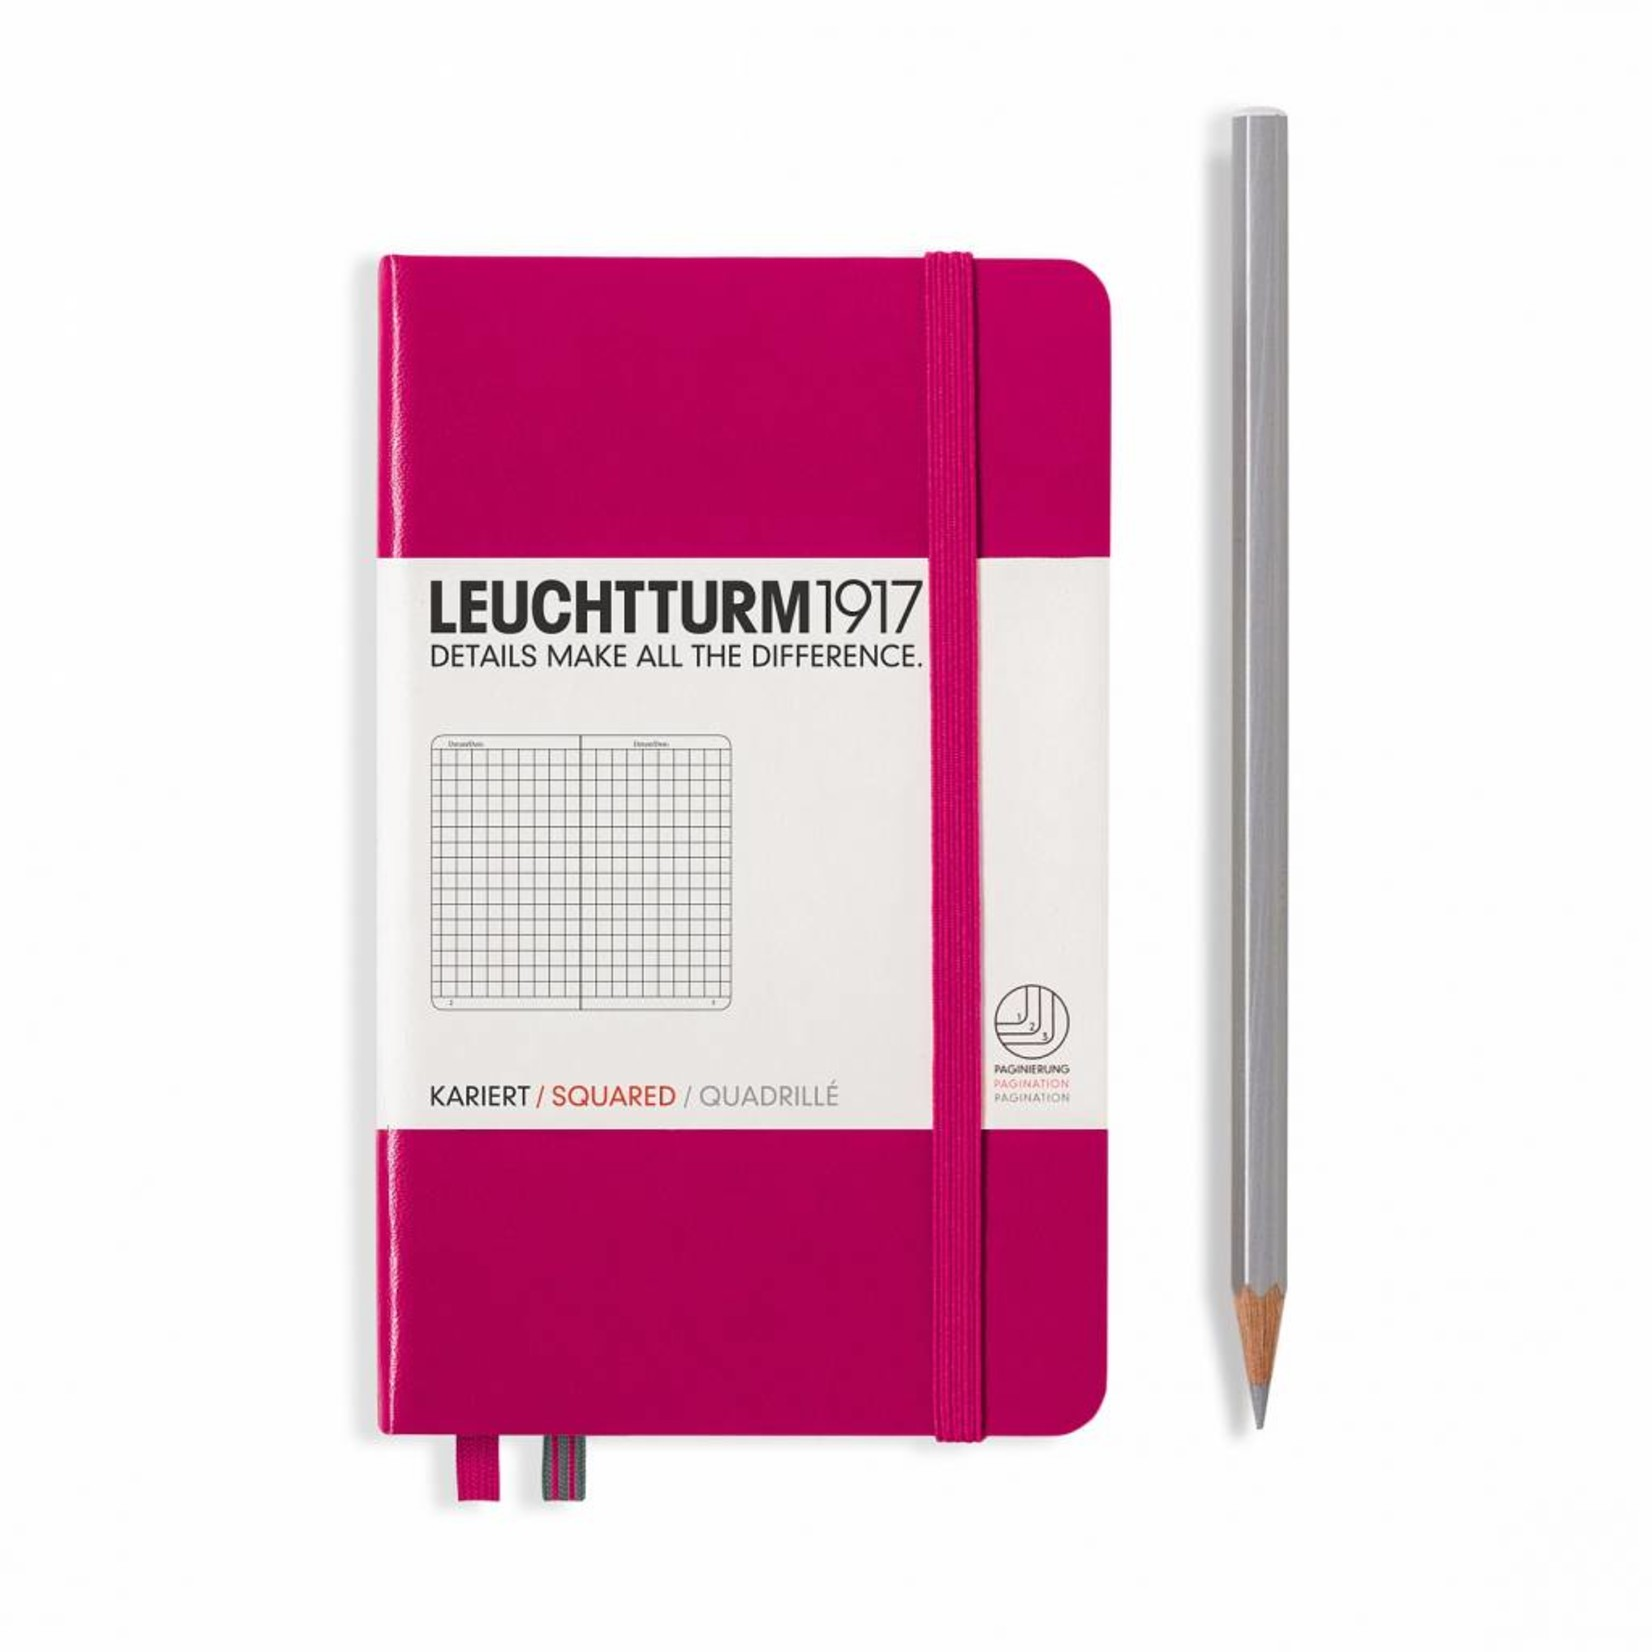 Leuchtturm1917 Leuchtturm1917 Notizbuch, Pocket, Beere, Kariert